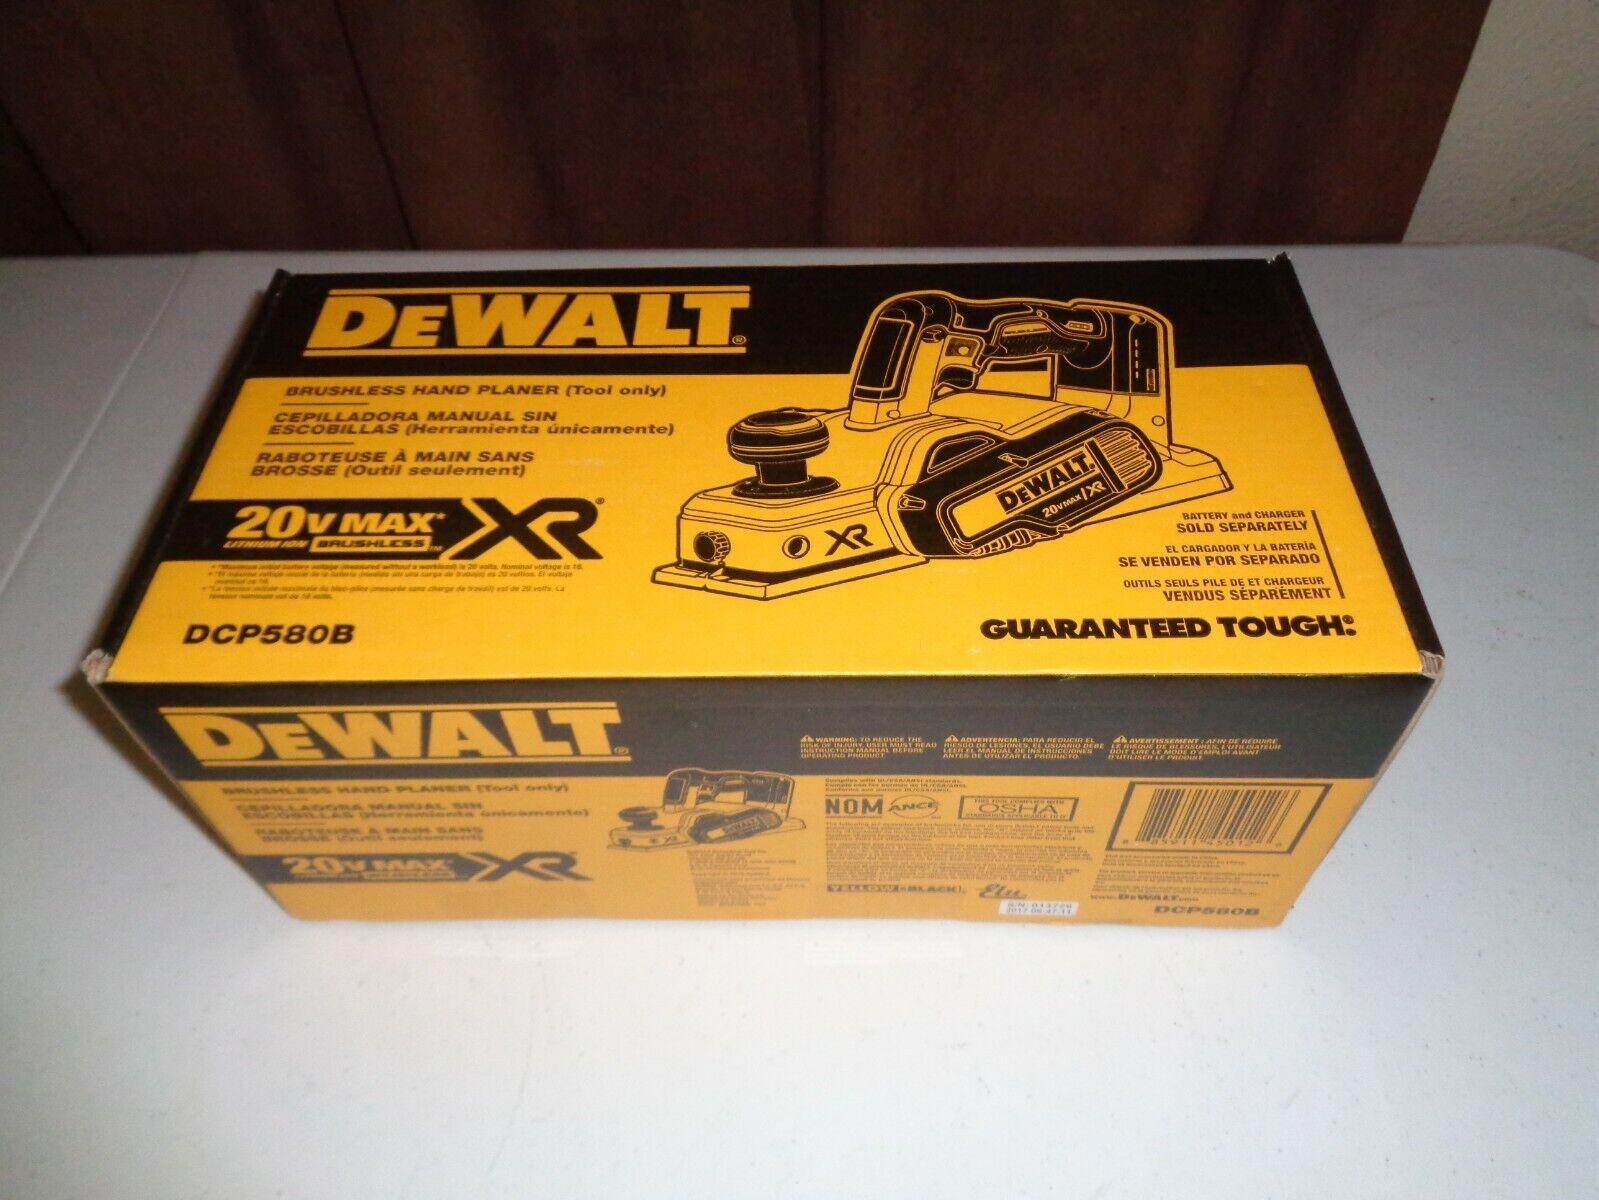 DEWALT DCP580B 20V MAX Lithium Ion Brushless 3-1 4  Cordless Planer